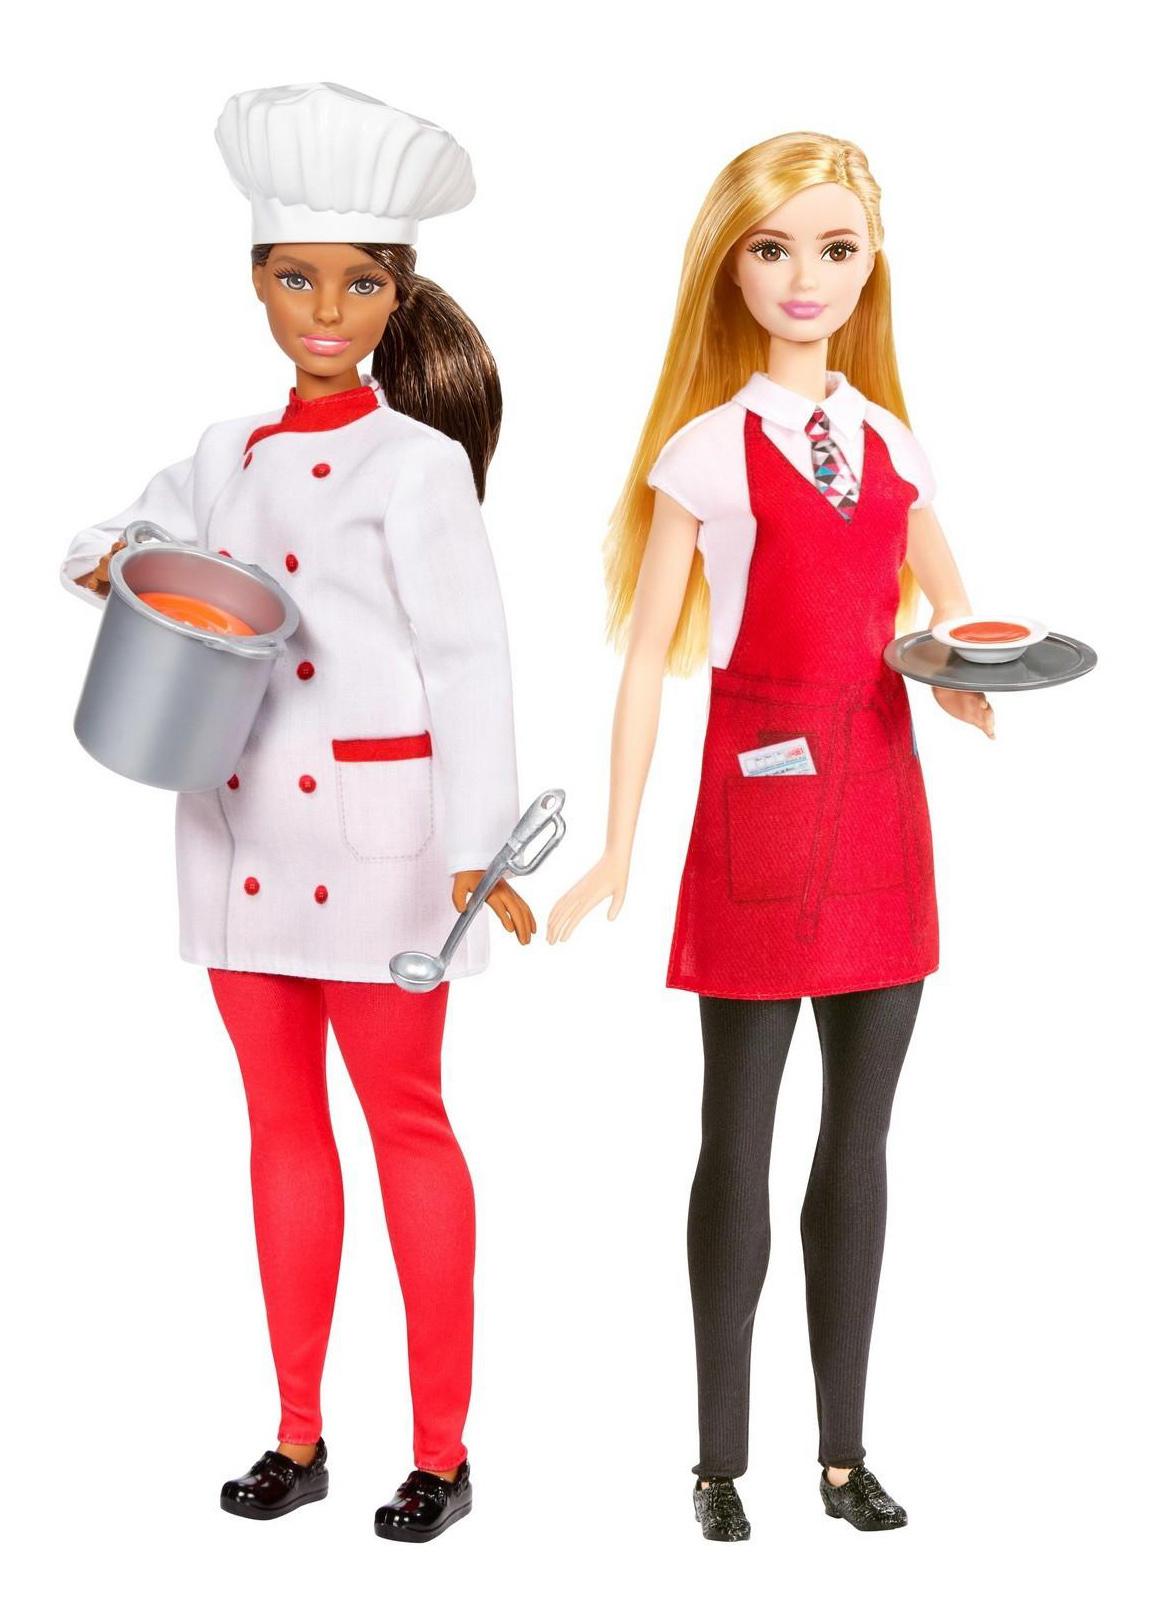 Кукла Barbie Повар и официантка фото